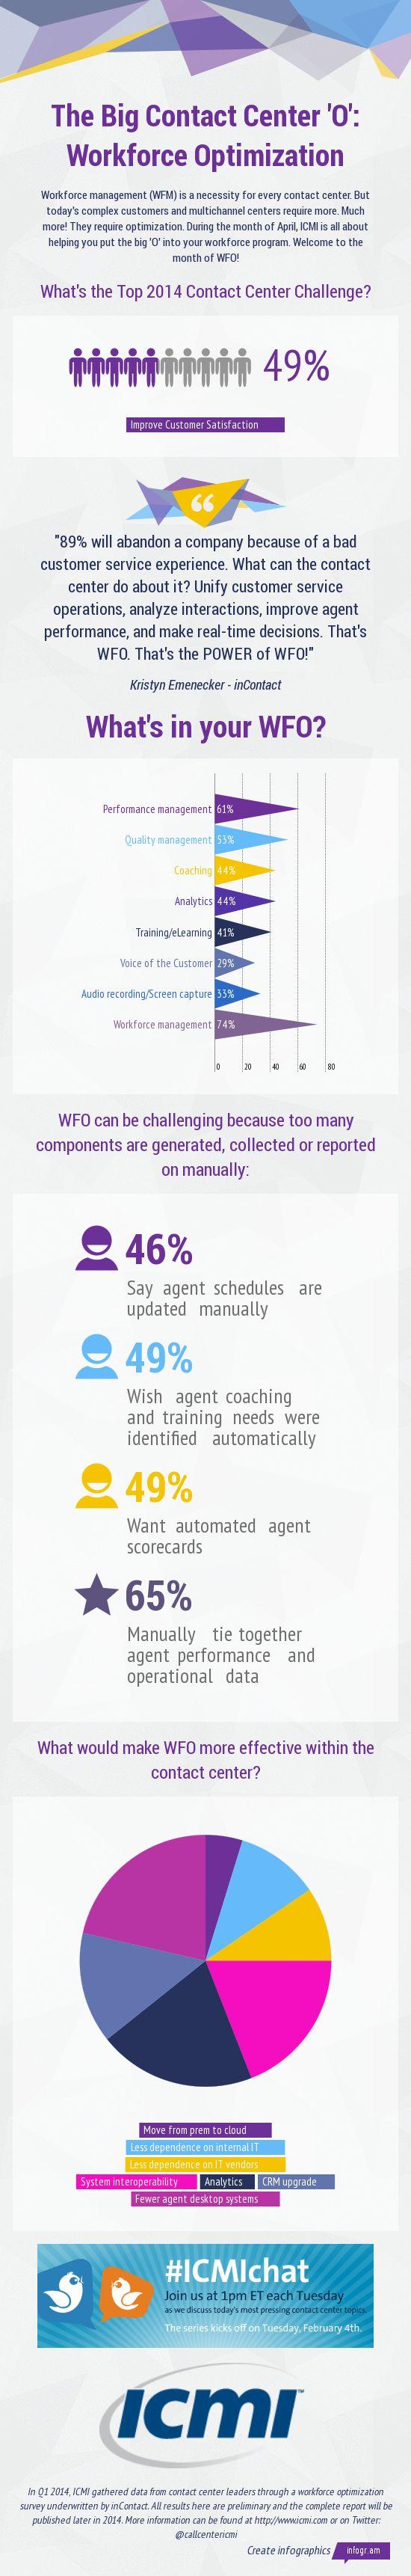 The Big Contact Center 'O': Workforce Optimization